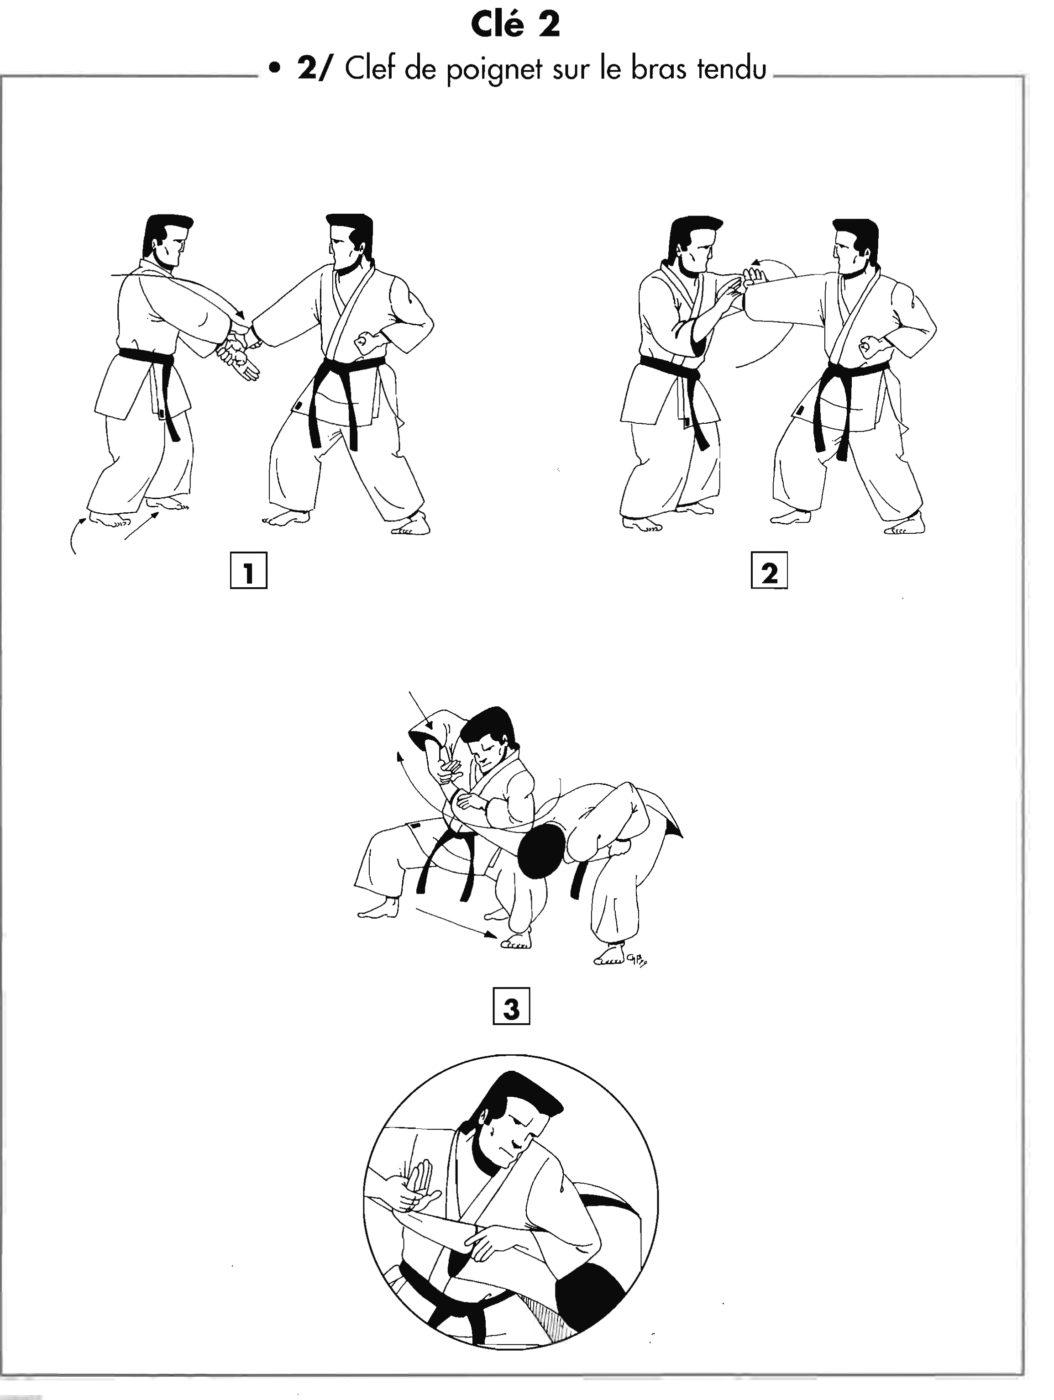 Clé : waki gatame – clé de poignet sur bras tendu